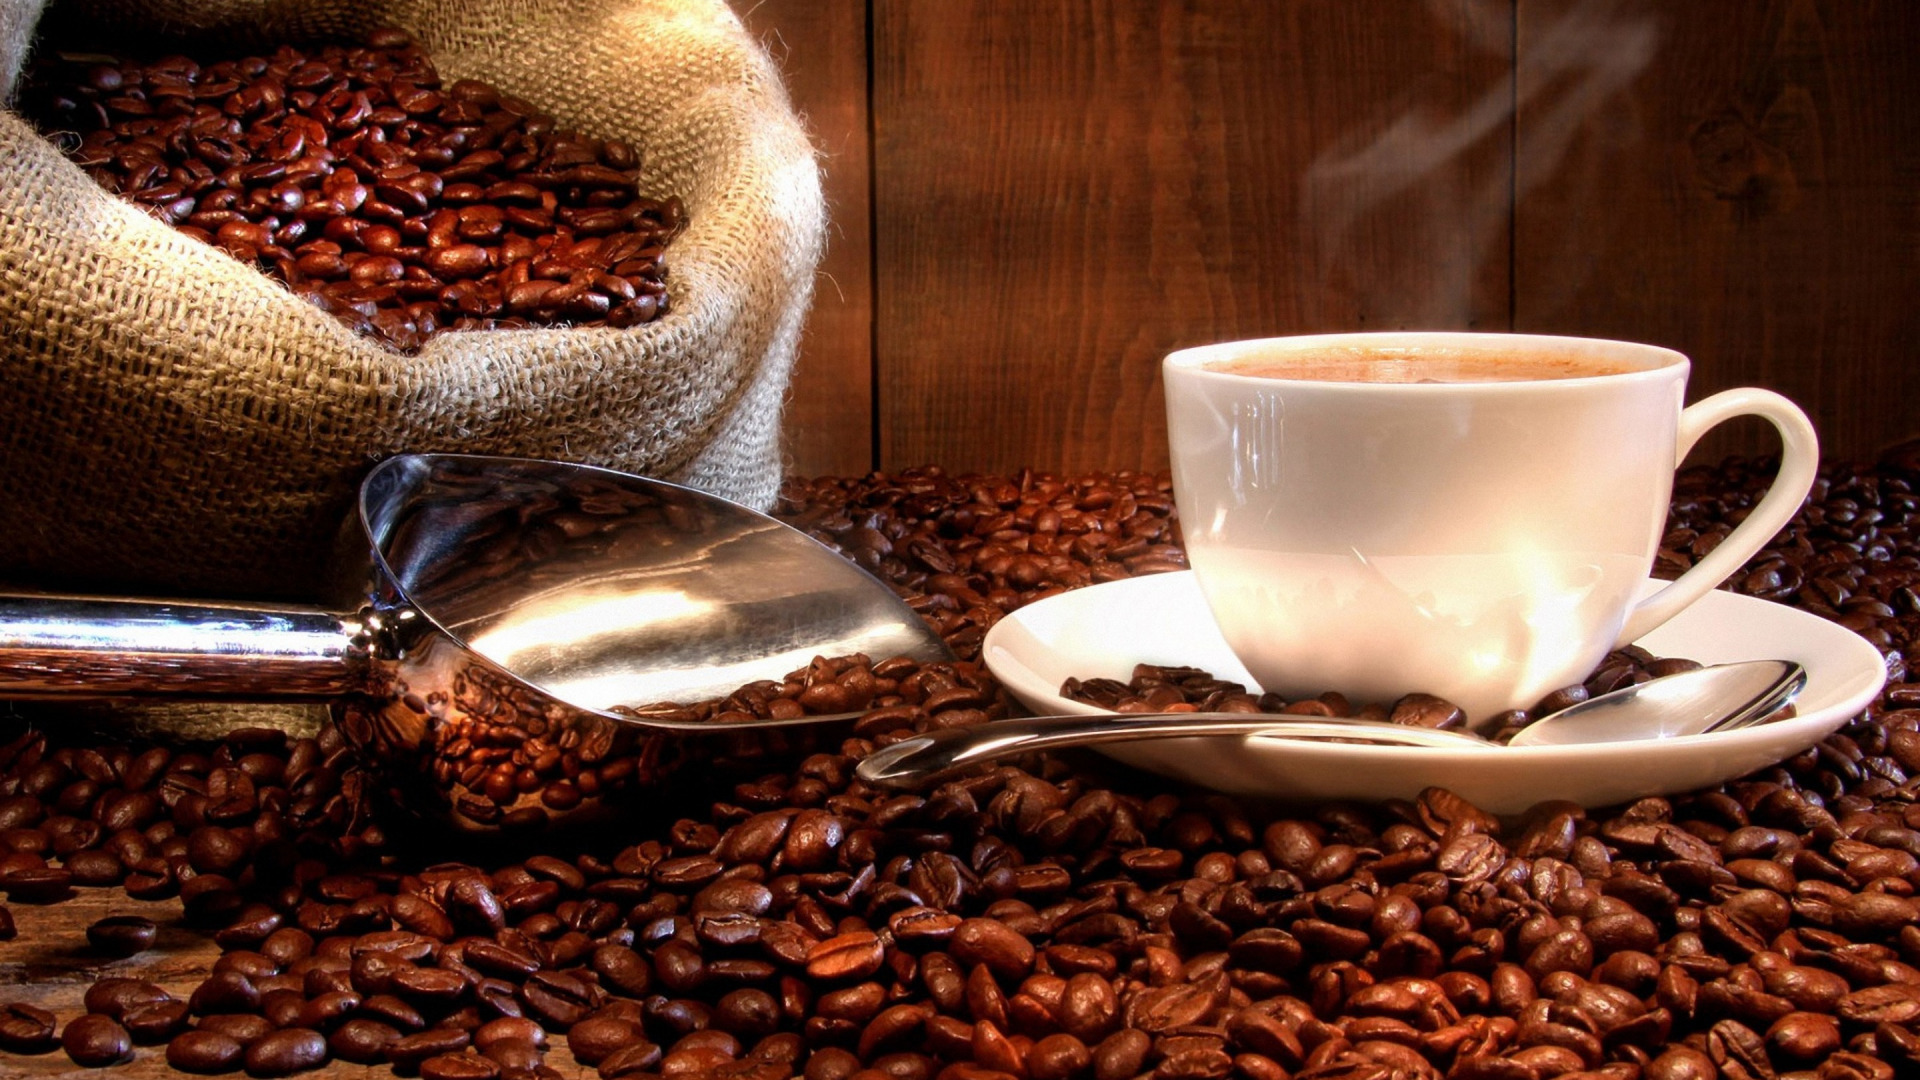 download wallpaper coffee